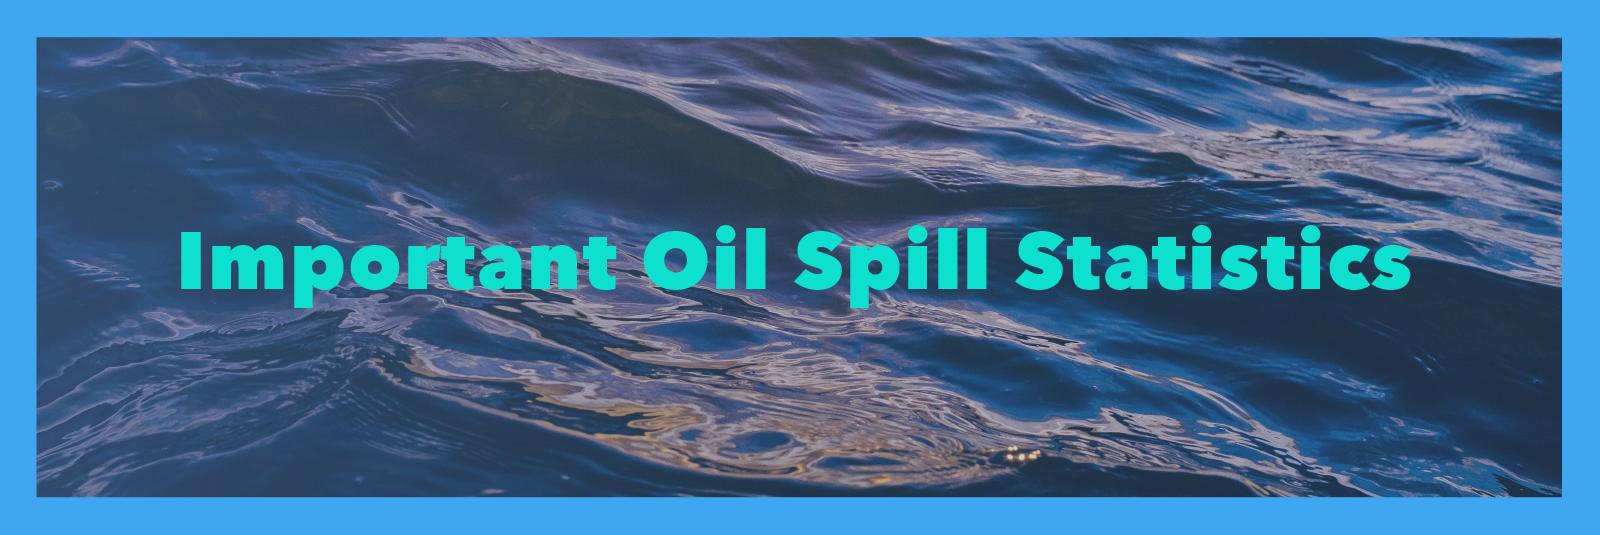 SHPI_Post_OilSpillStatistics_72DPI_Website